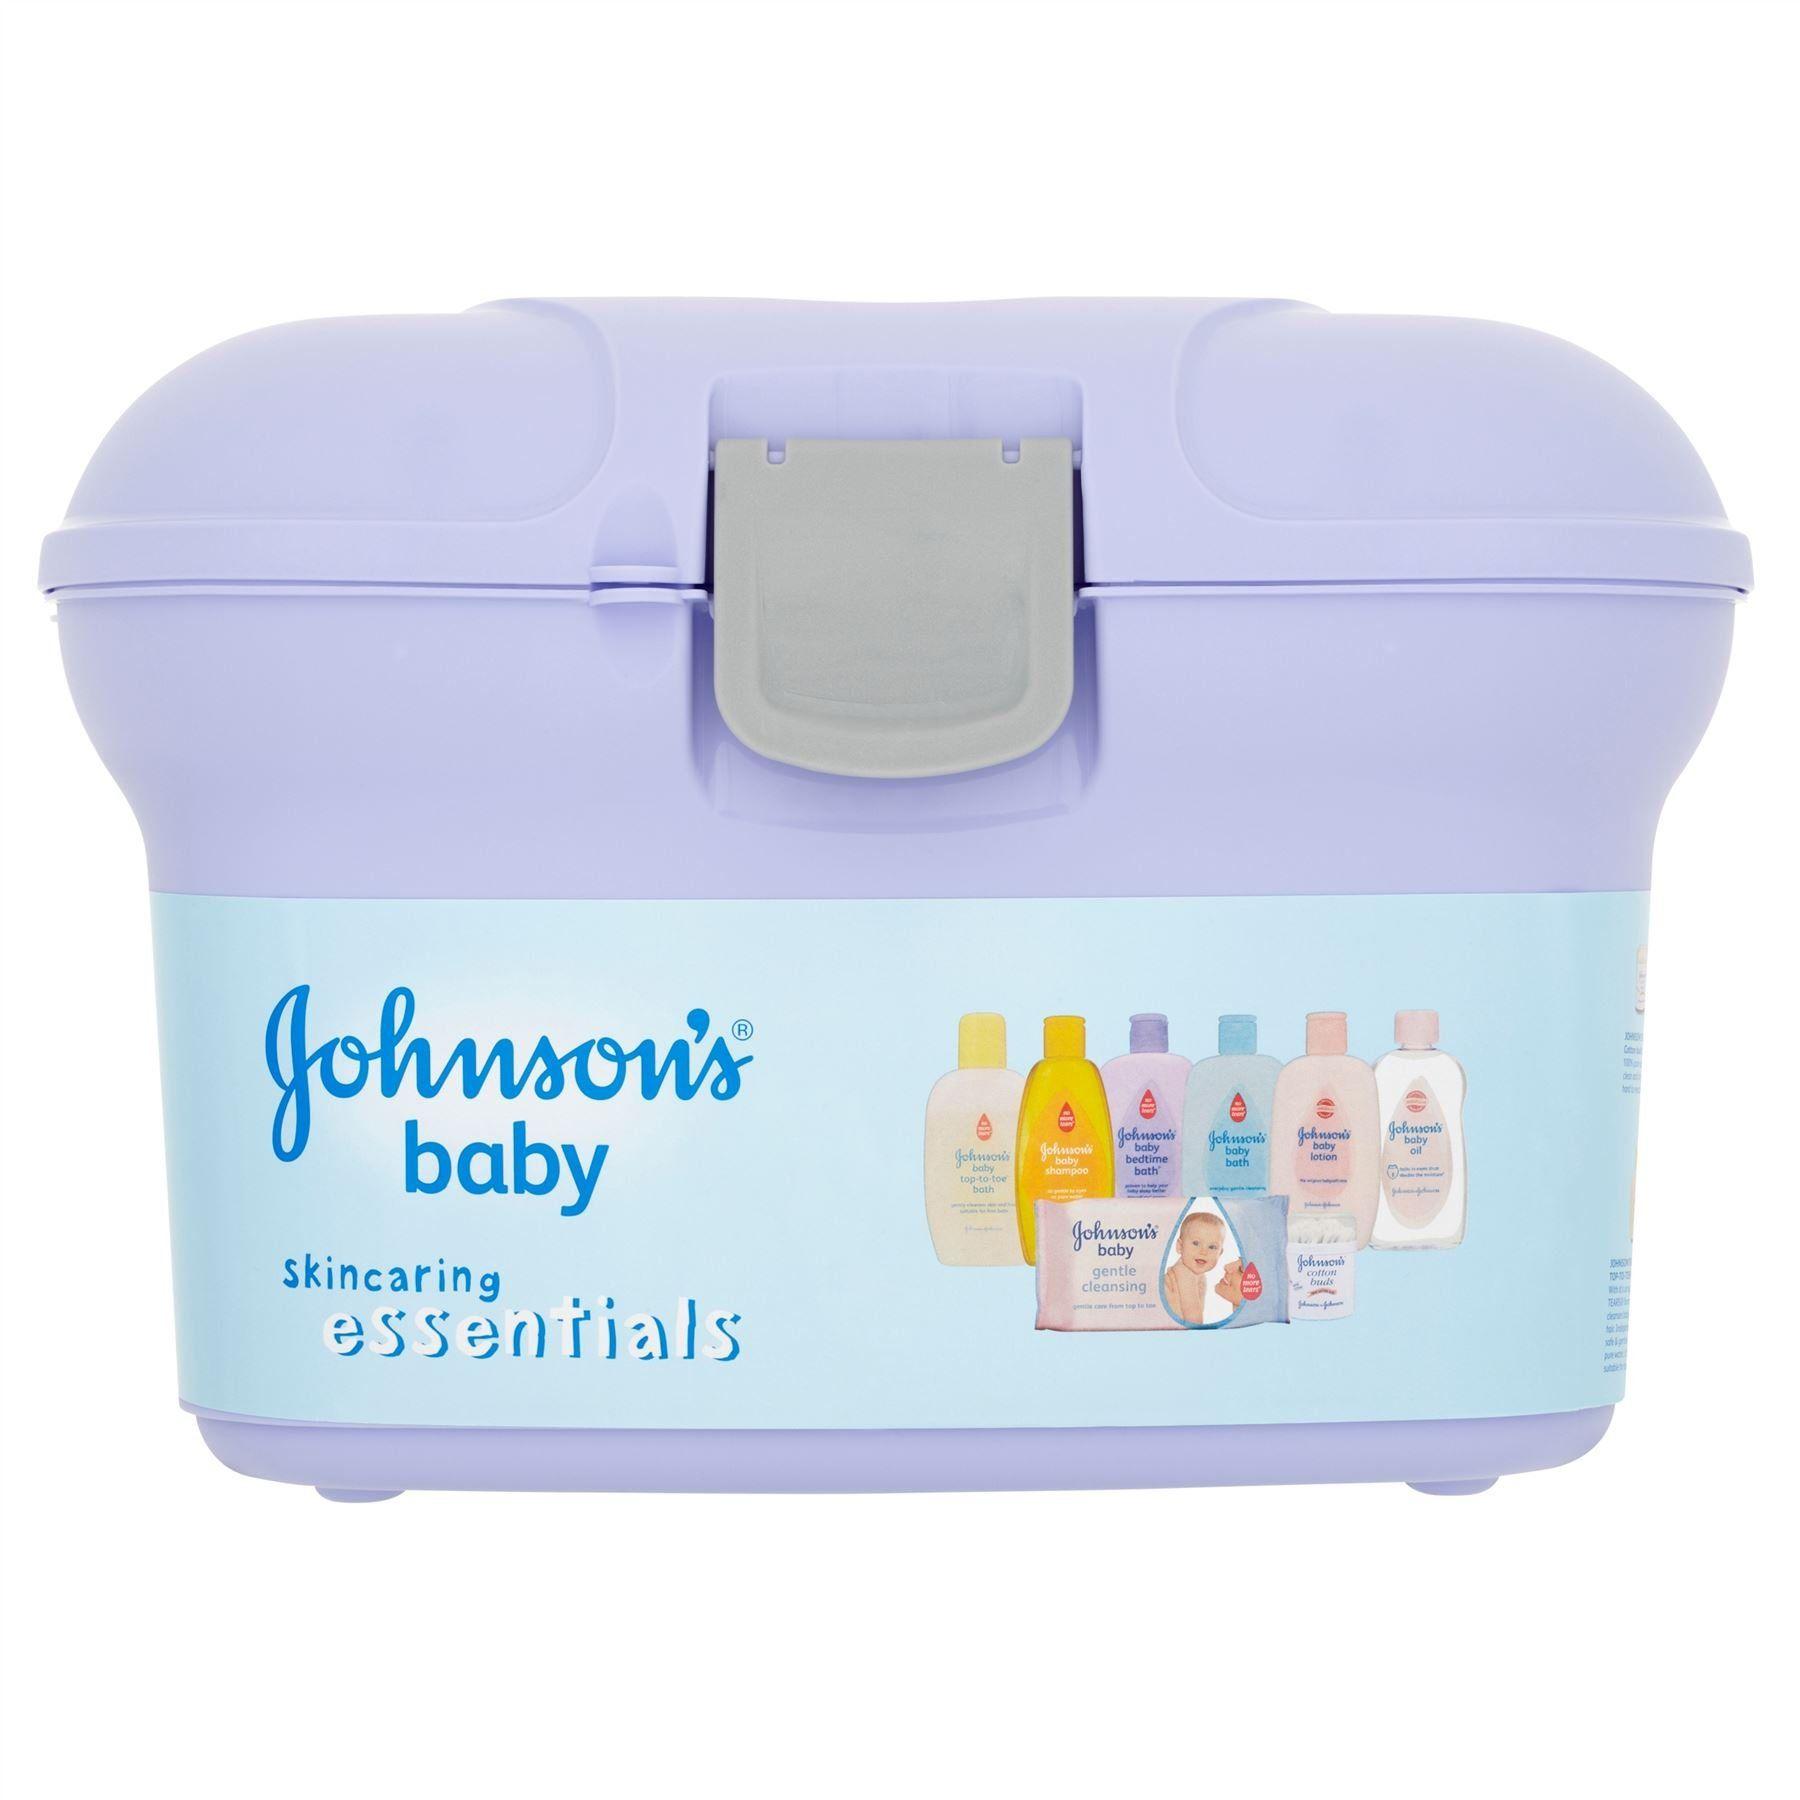 Johnson & Johnson Baby Skincaring Essentials Box: Amazon.co.uk ...